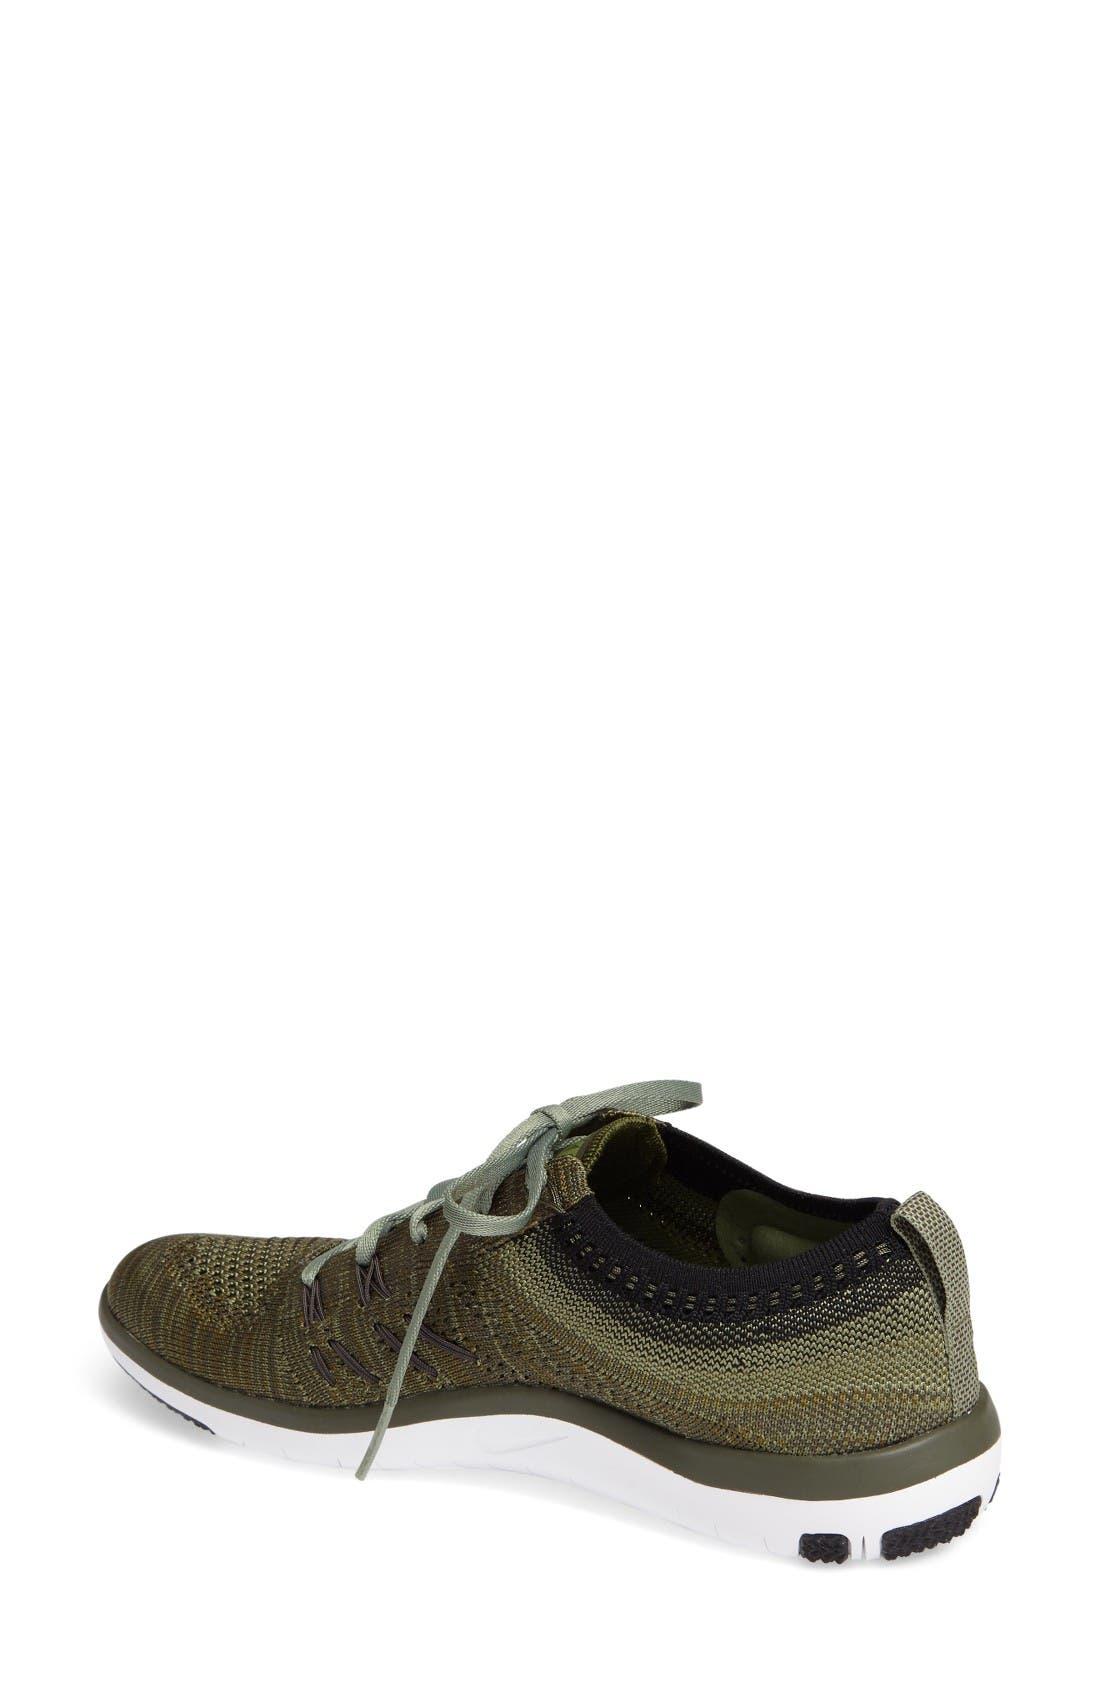 Alternate Image 2  - Nike 'Free TR Focus Flyknit' Training Shoe (Women)